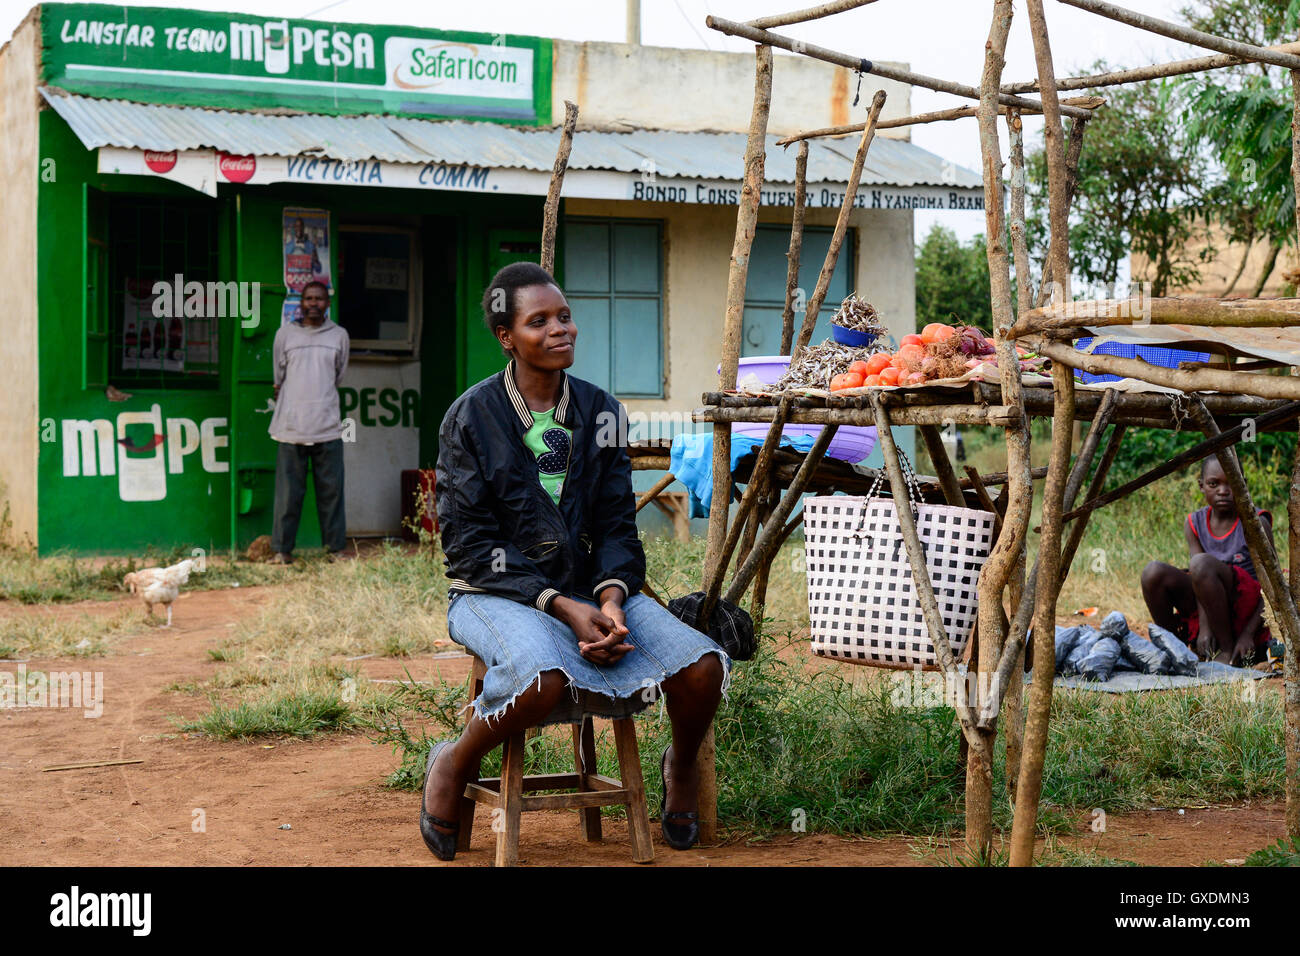 KENIA, County Siaya, village Kotanega, shop M-Pesa, of company Safari.com a joint venture of Vodafone and kenyan Stock Photo